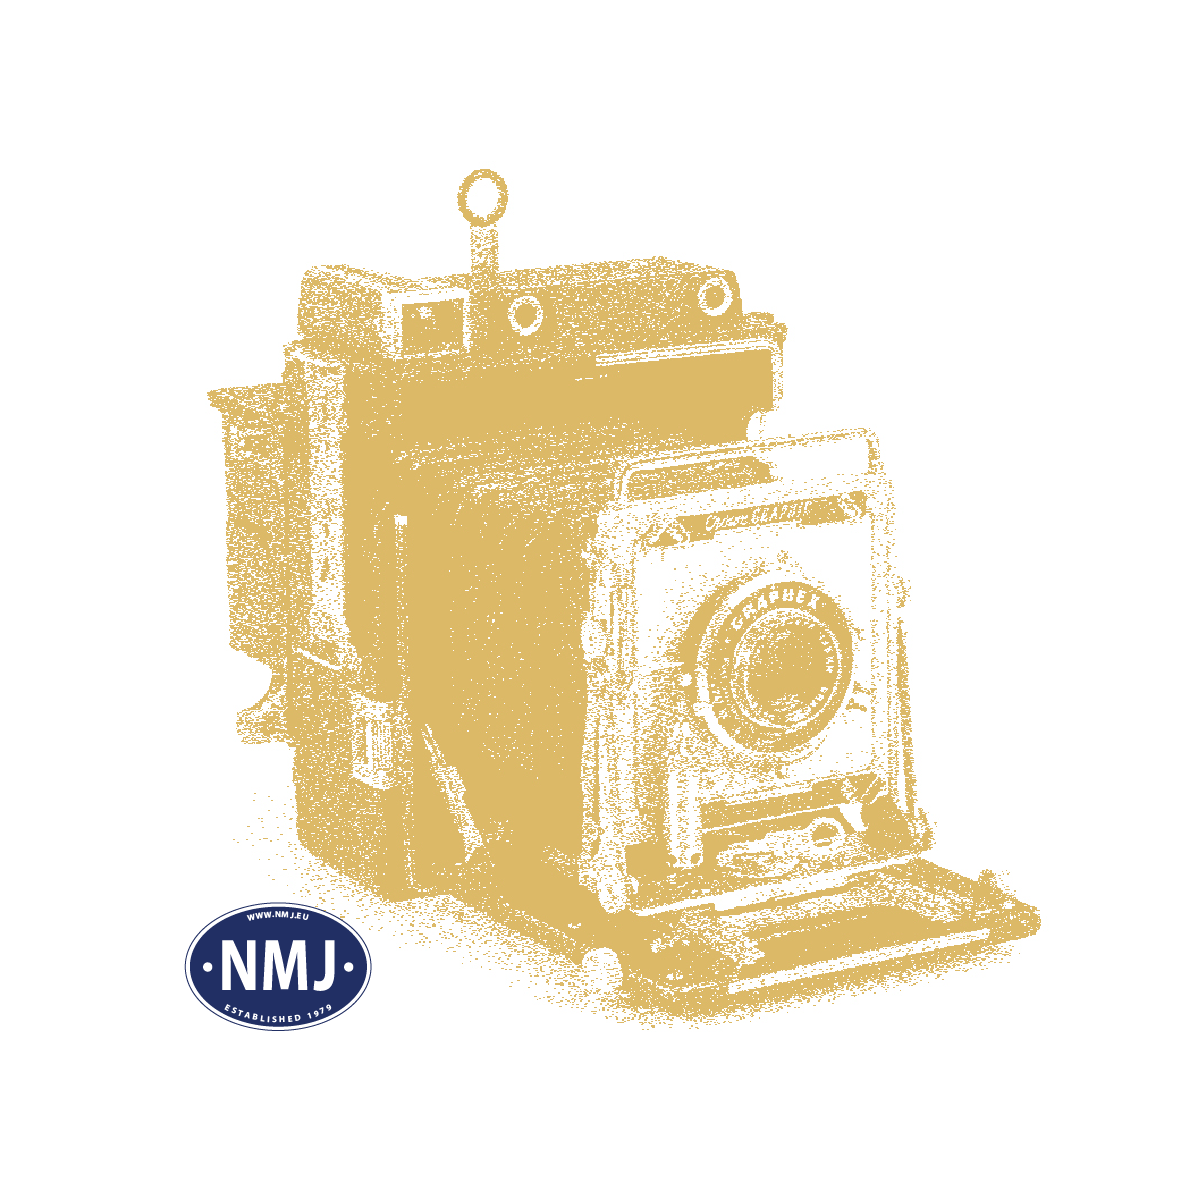 NOC15531 - Reisende m/ Tilbehør